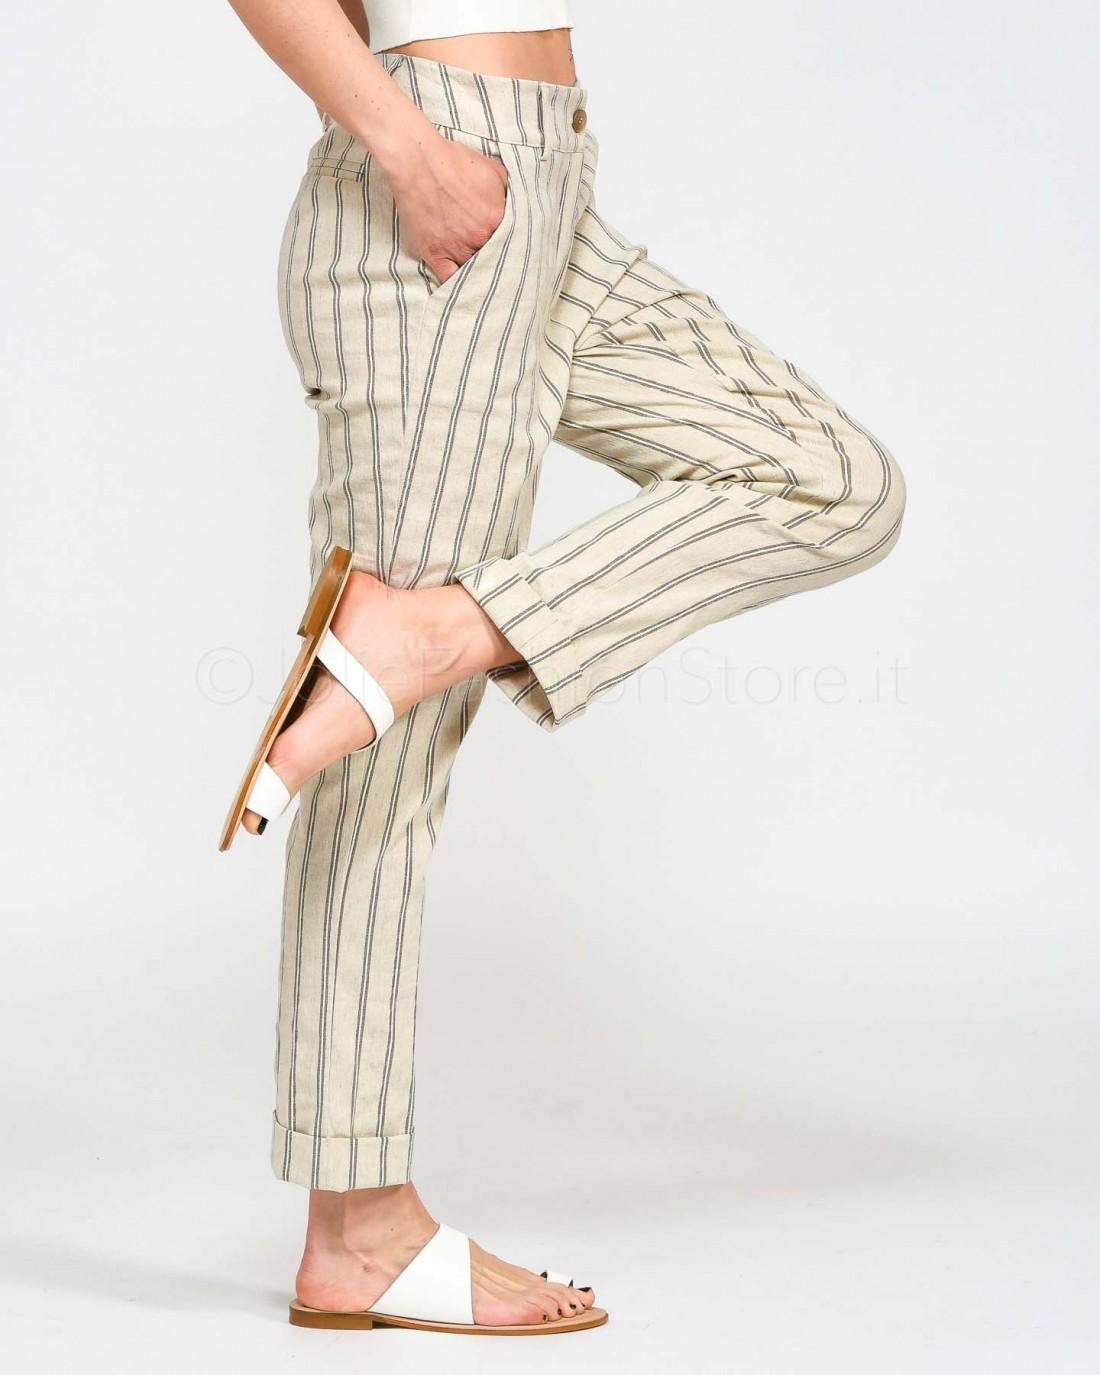 Background Pantalone Maschile Righe Beige  P21YW223D-BEIGE